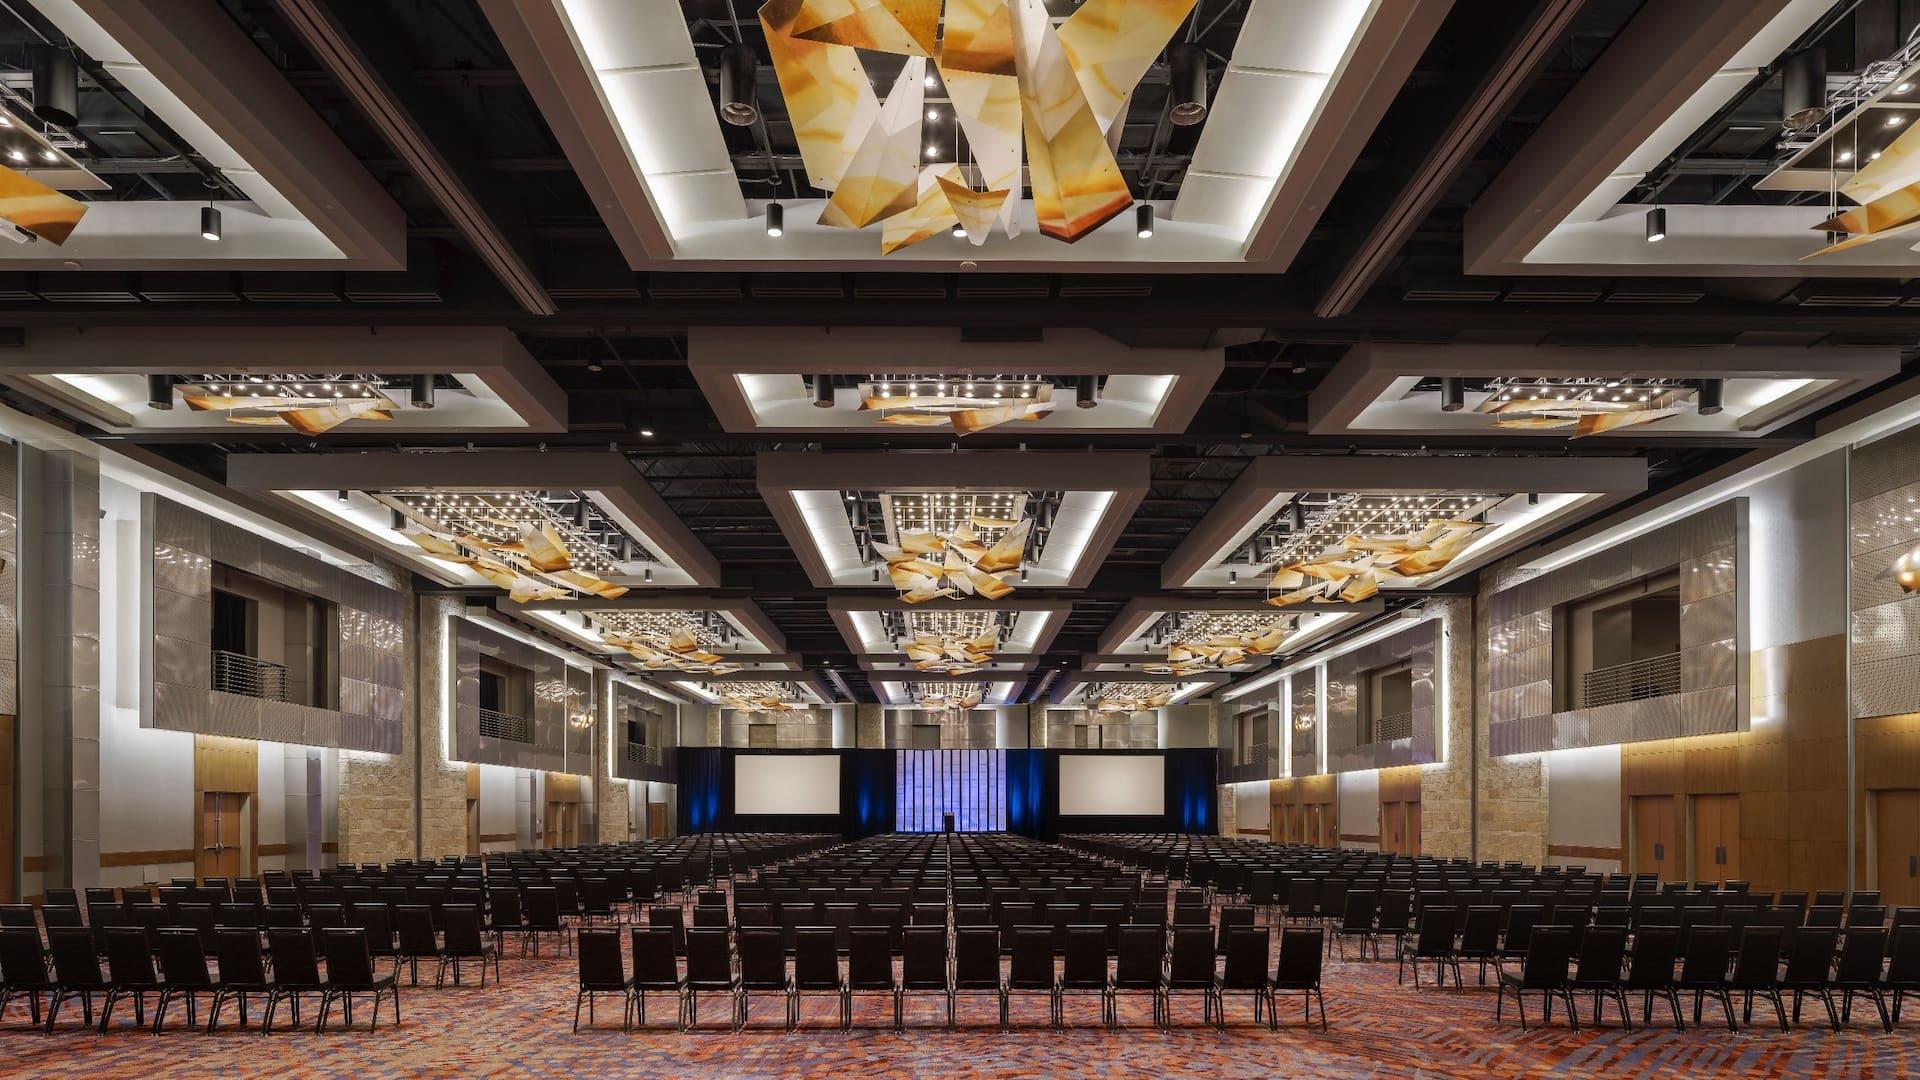 Meeting Room Auditorium Setup Hyatt Regency Denver